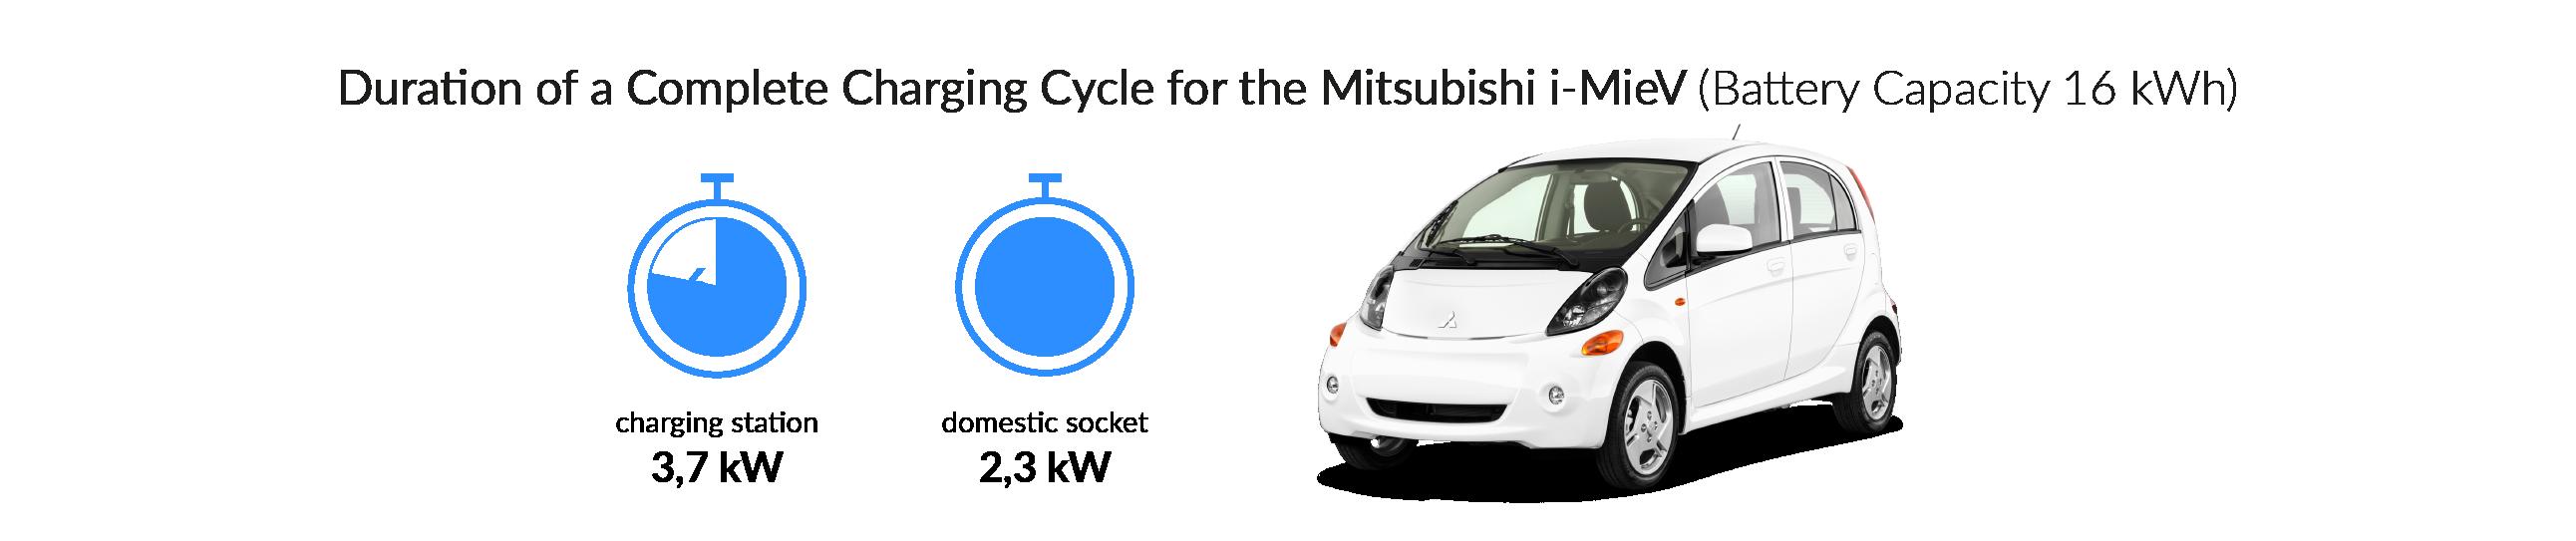 Charging time for your Mitsubishi i-MiEV